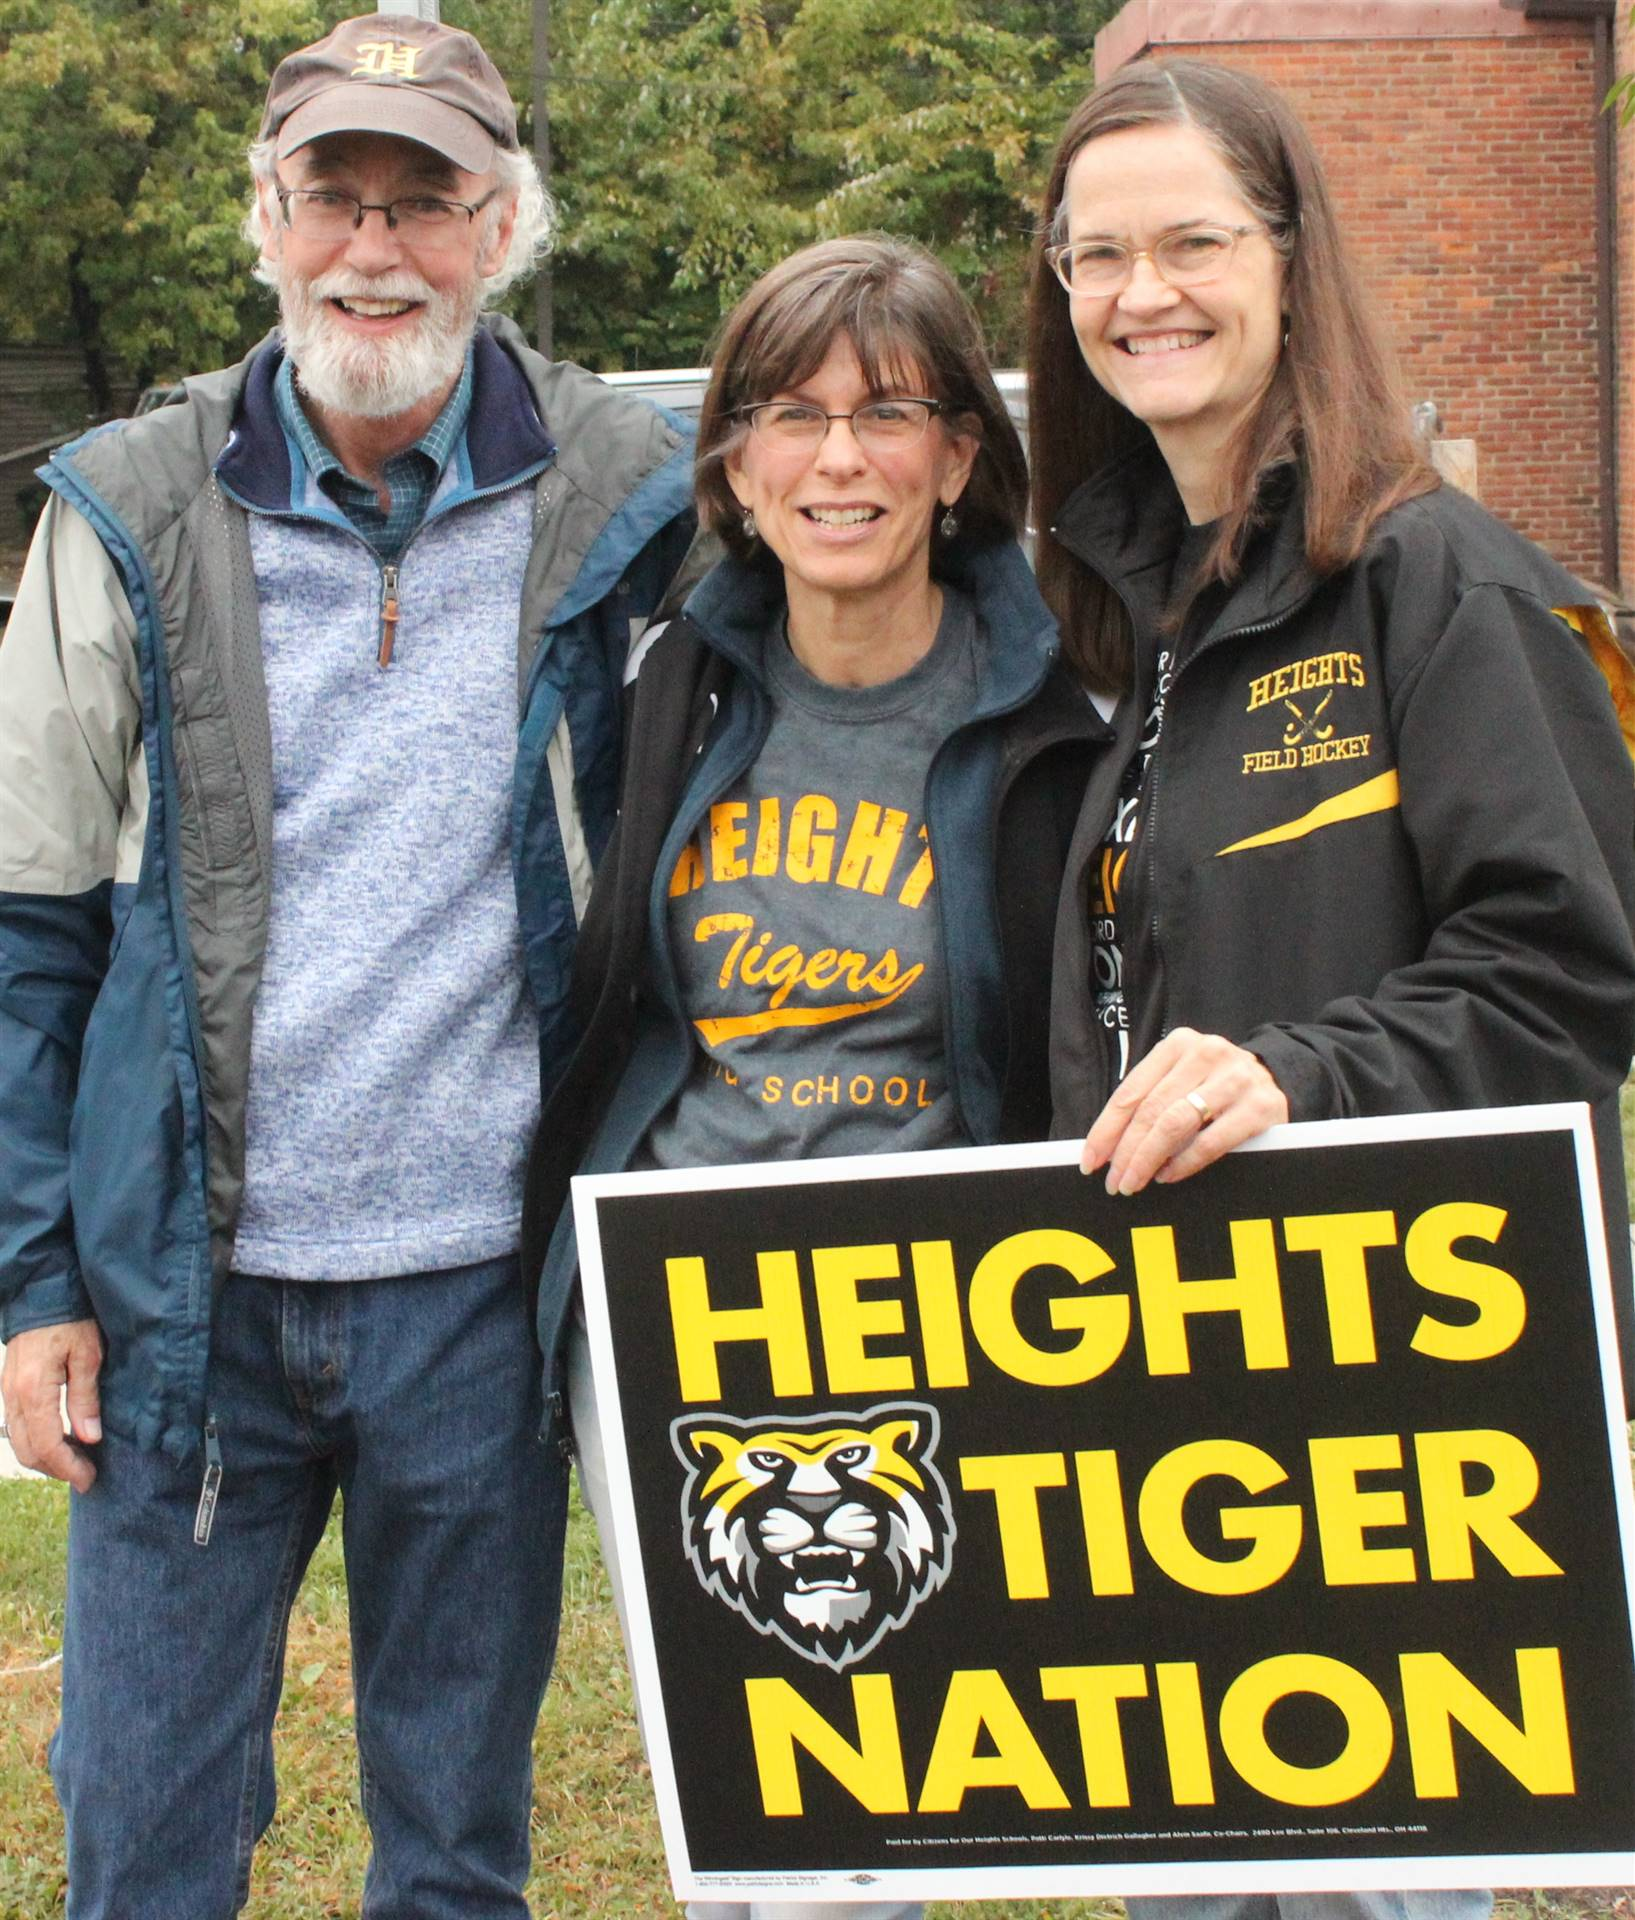 Reaching Heights Ex. Dir, Krista Hawthorne (R) and board members